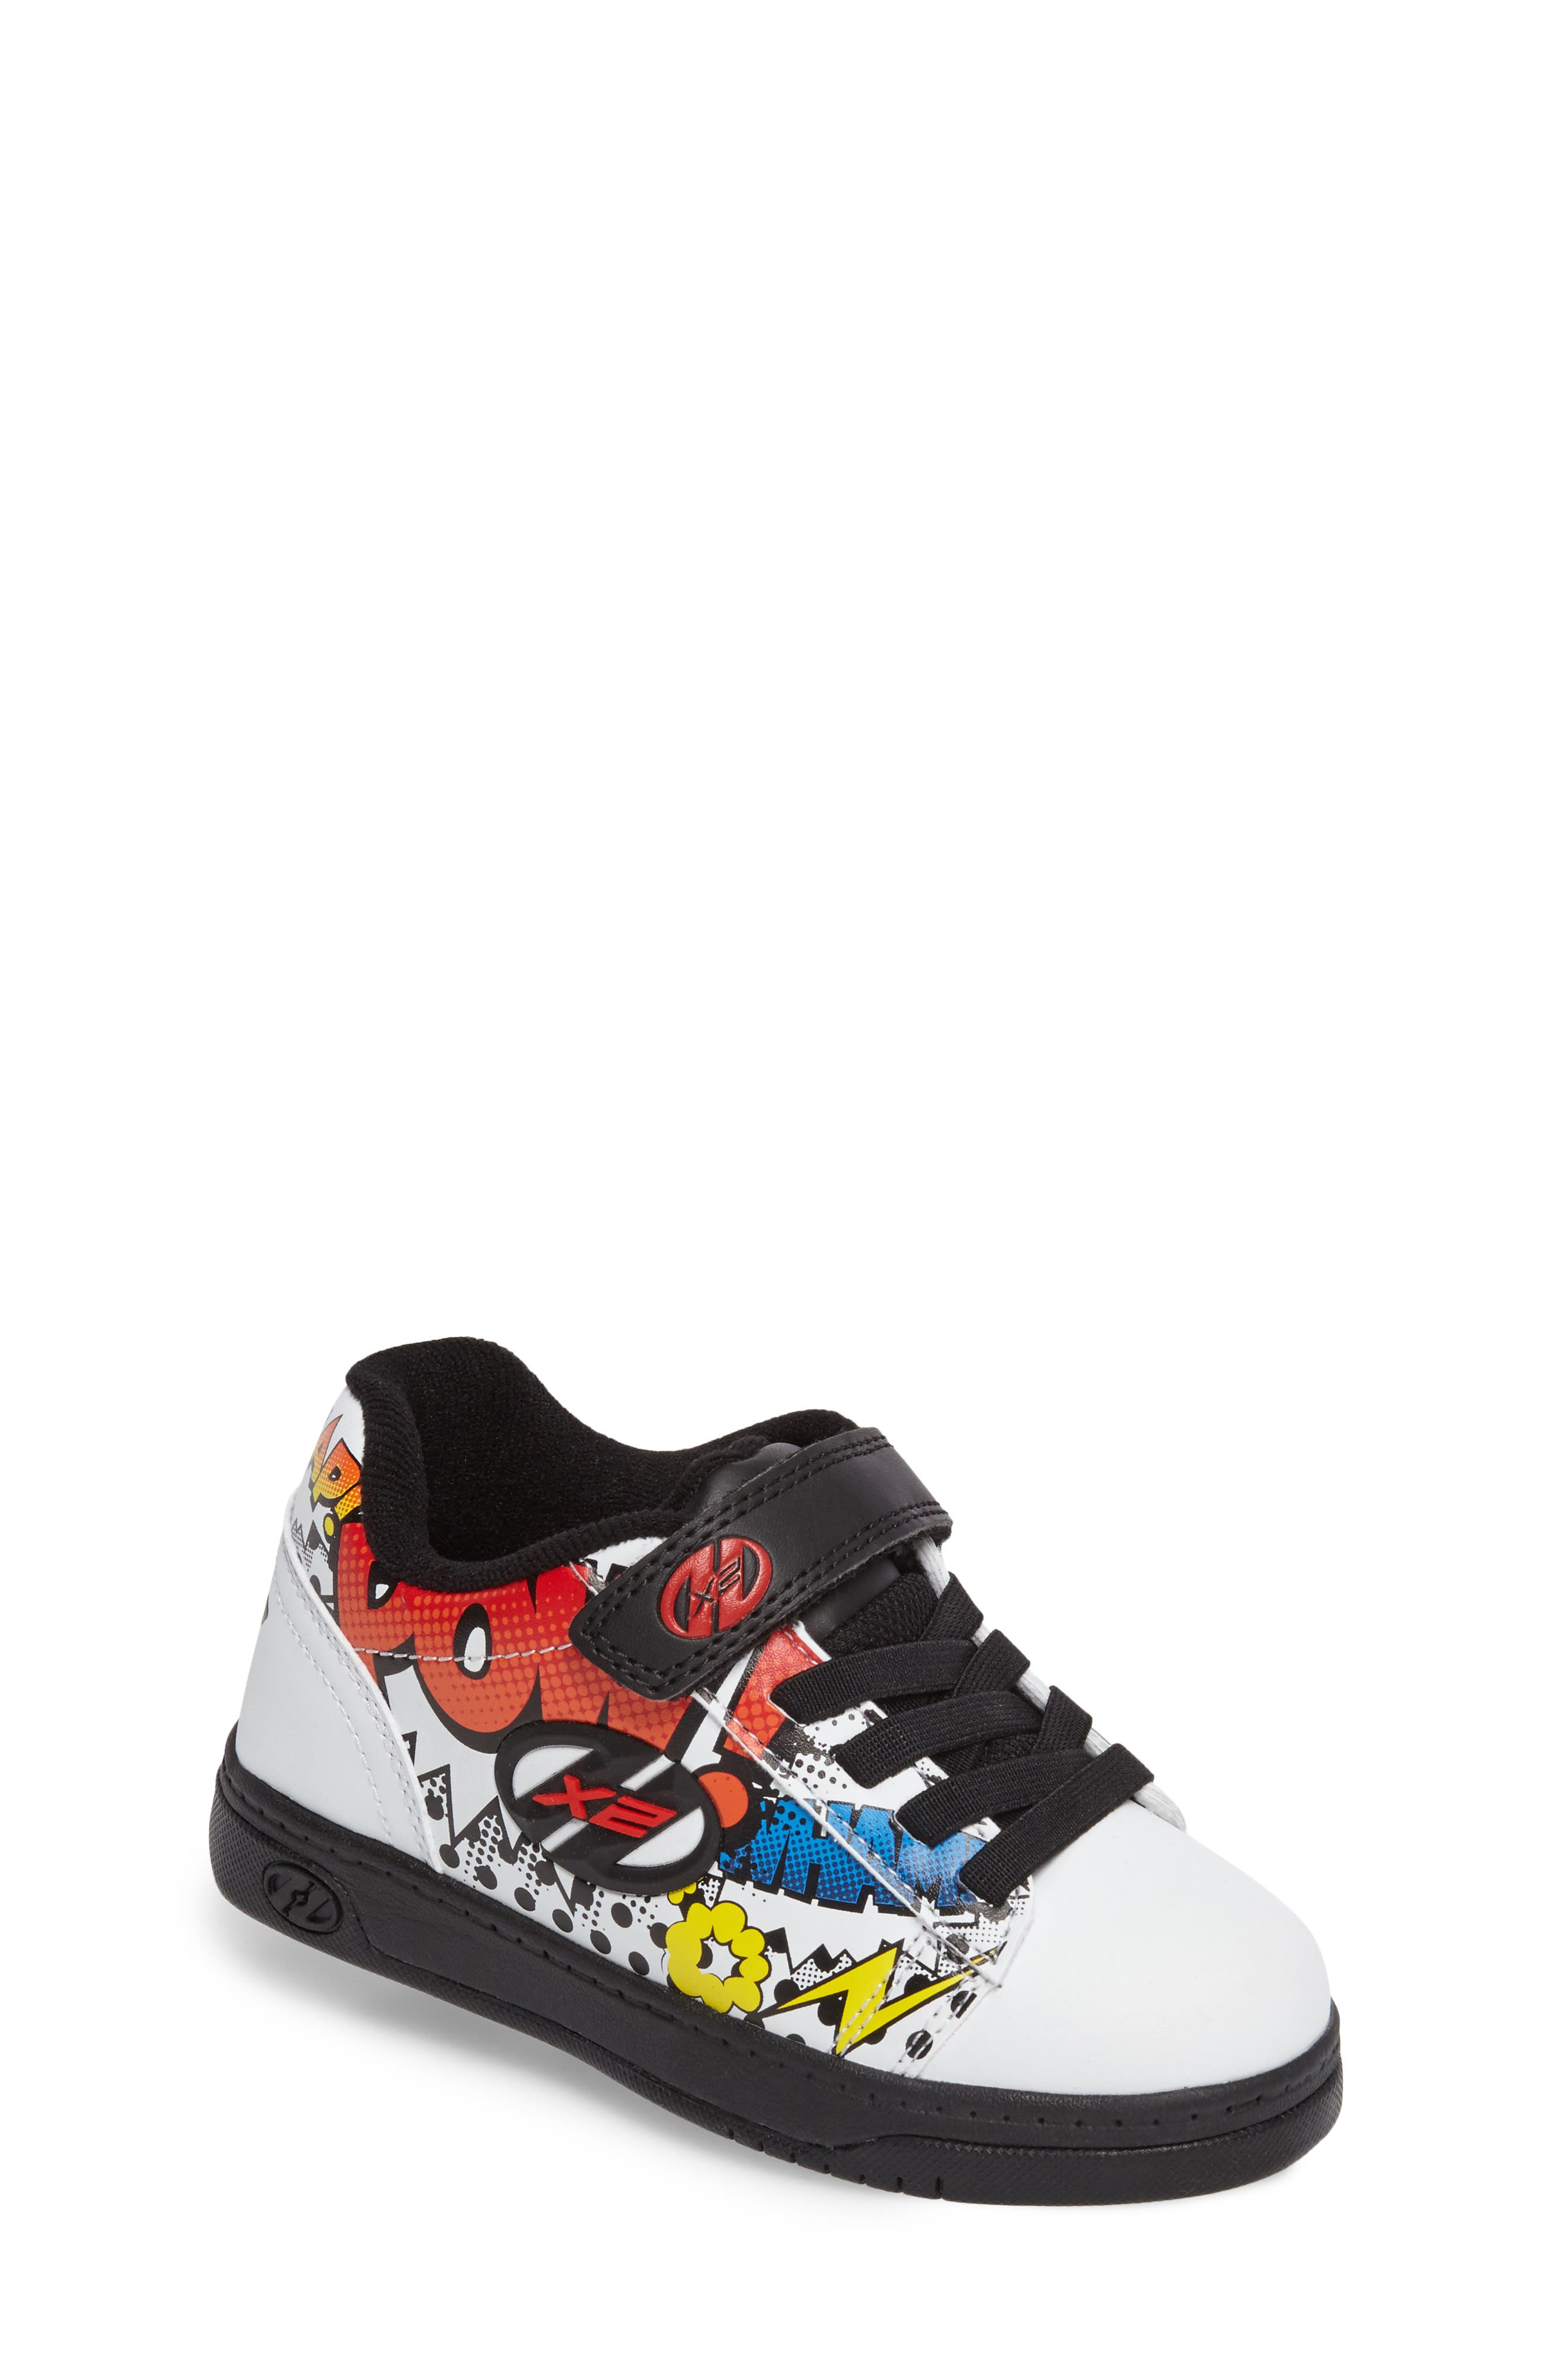 2489d0a03376 Boys Nike Dual Size 1.5